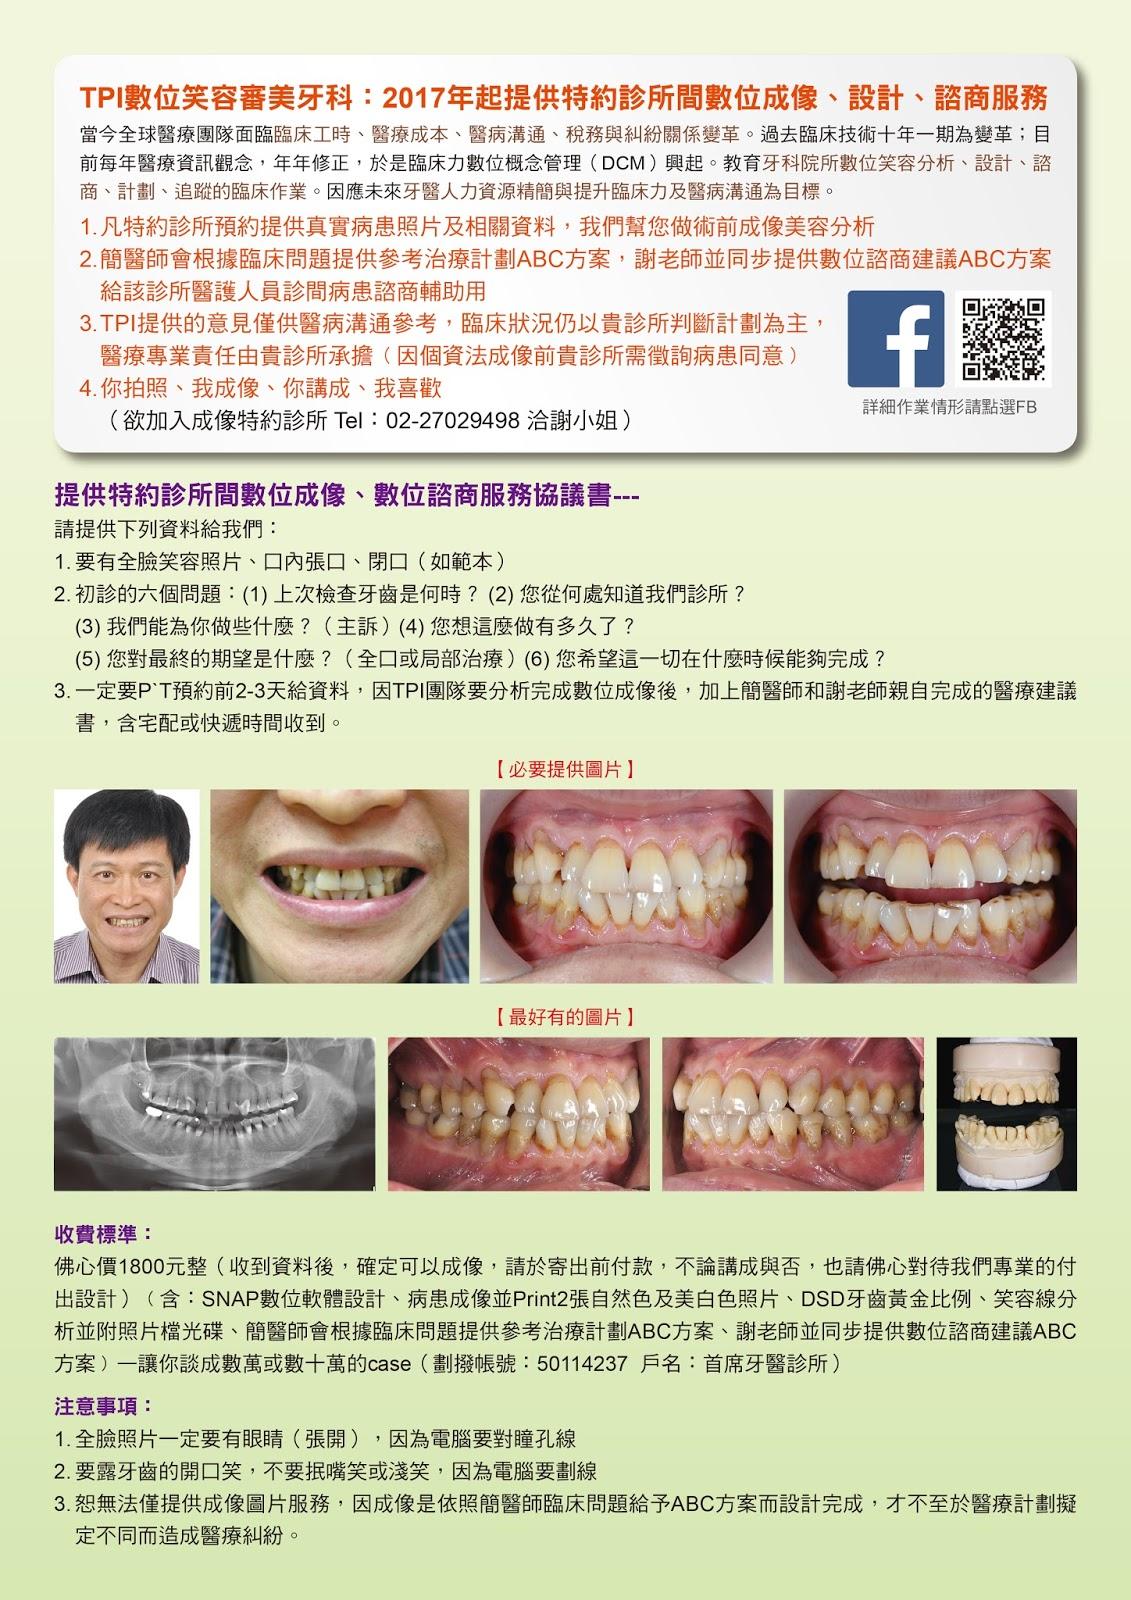 臺北首席牙醫美容讀書會Taipei premier Institute Smile Library